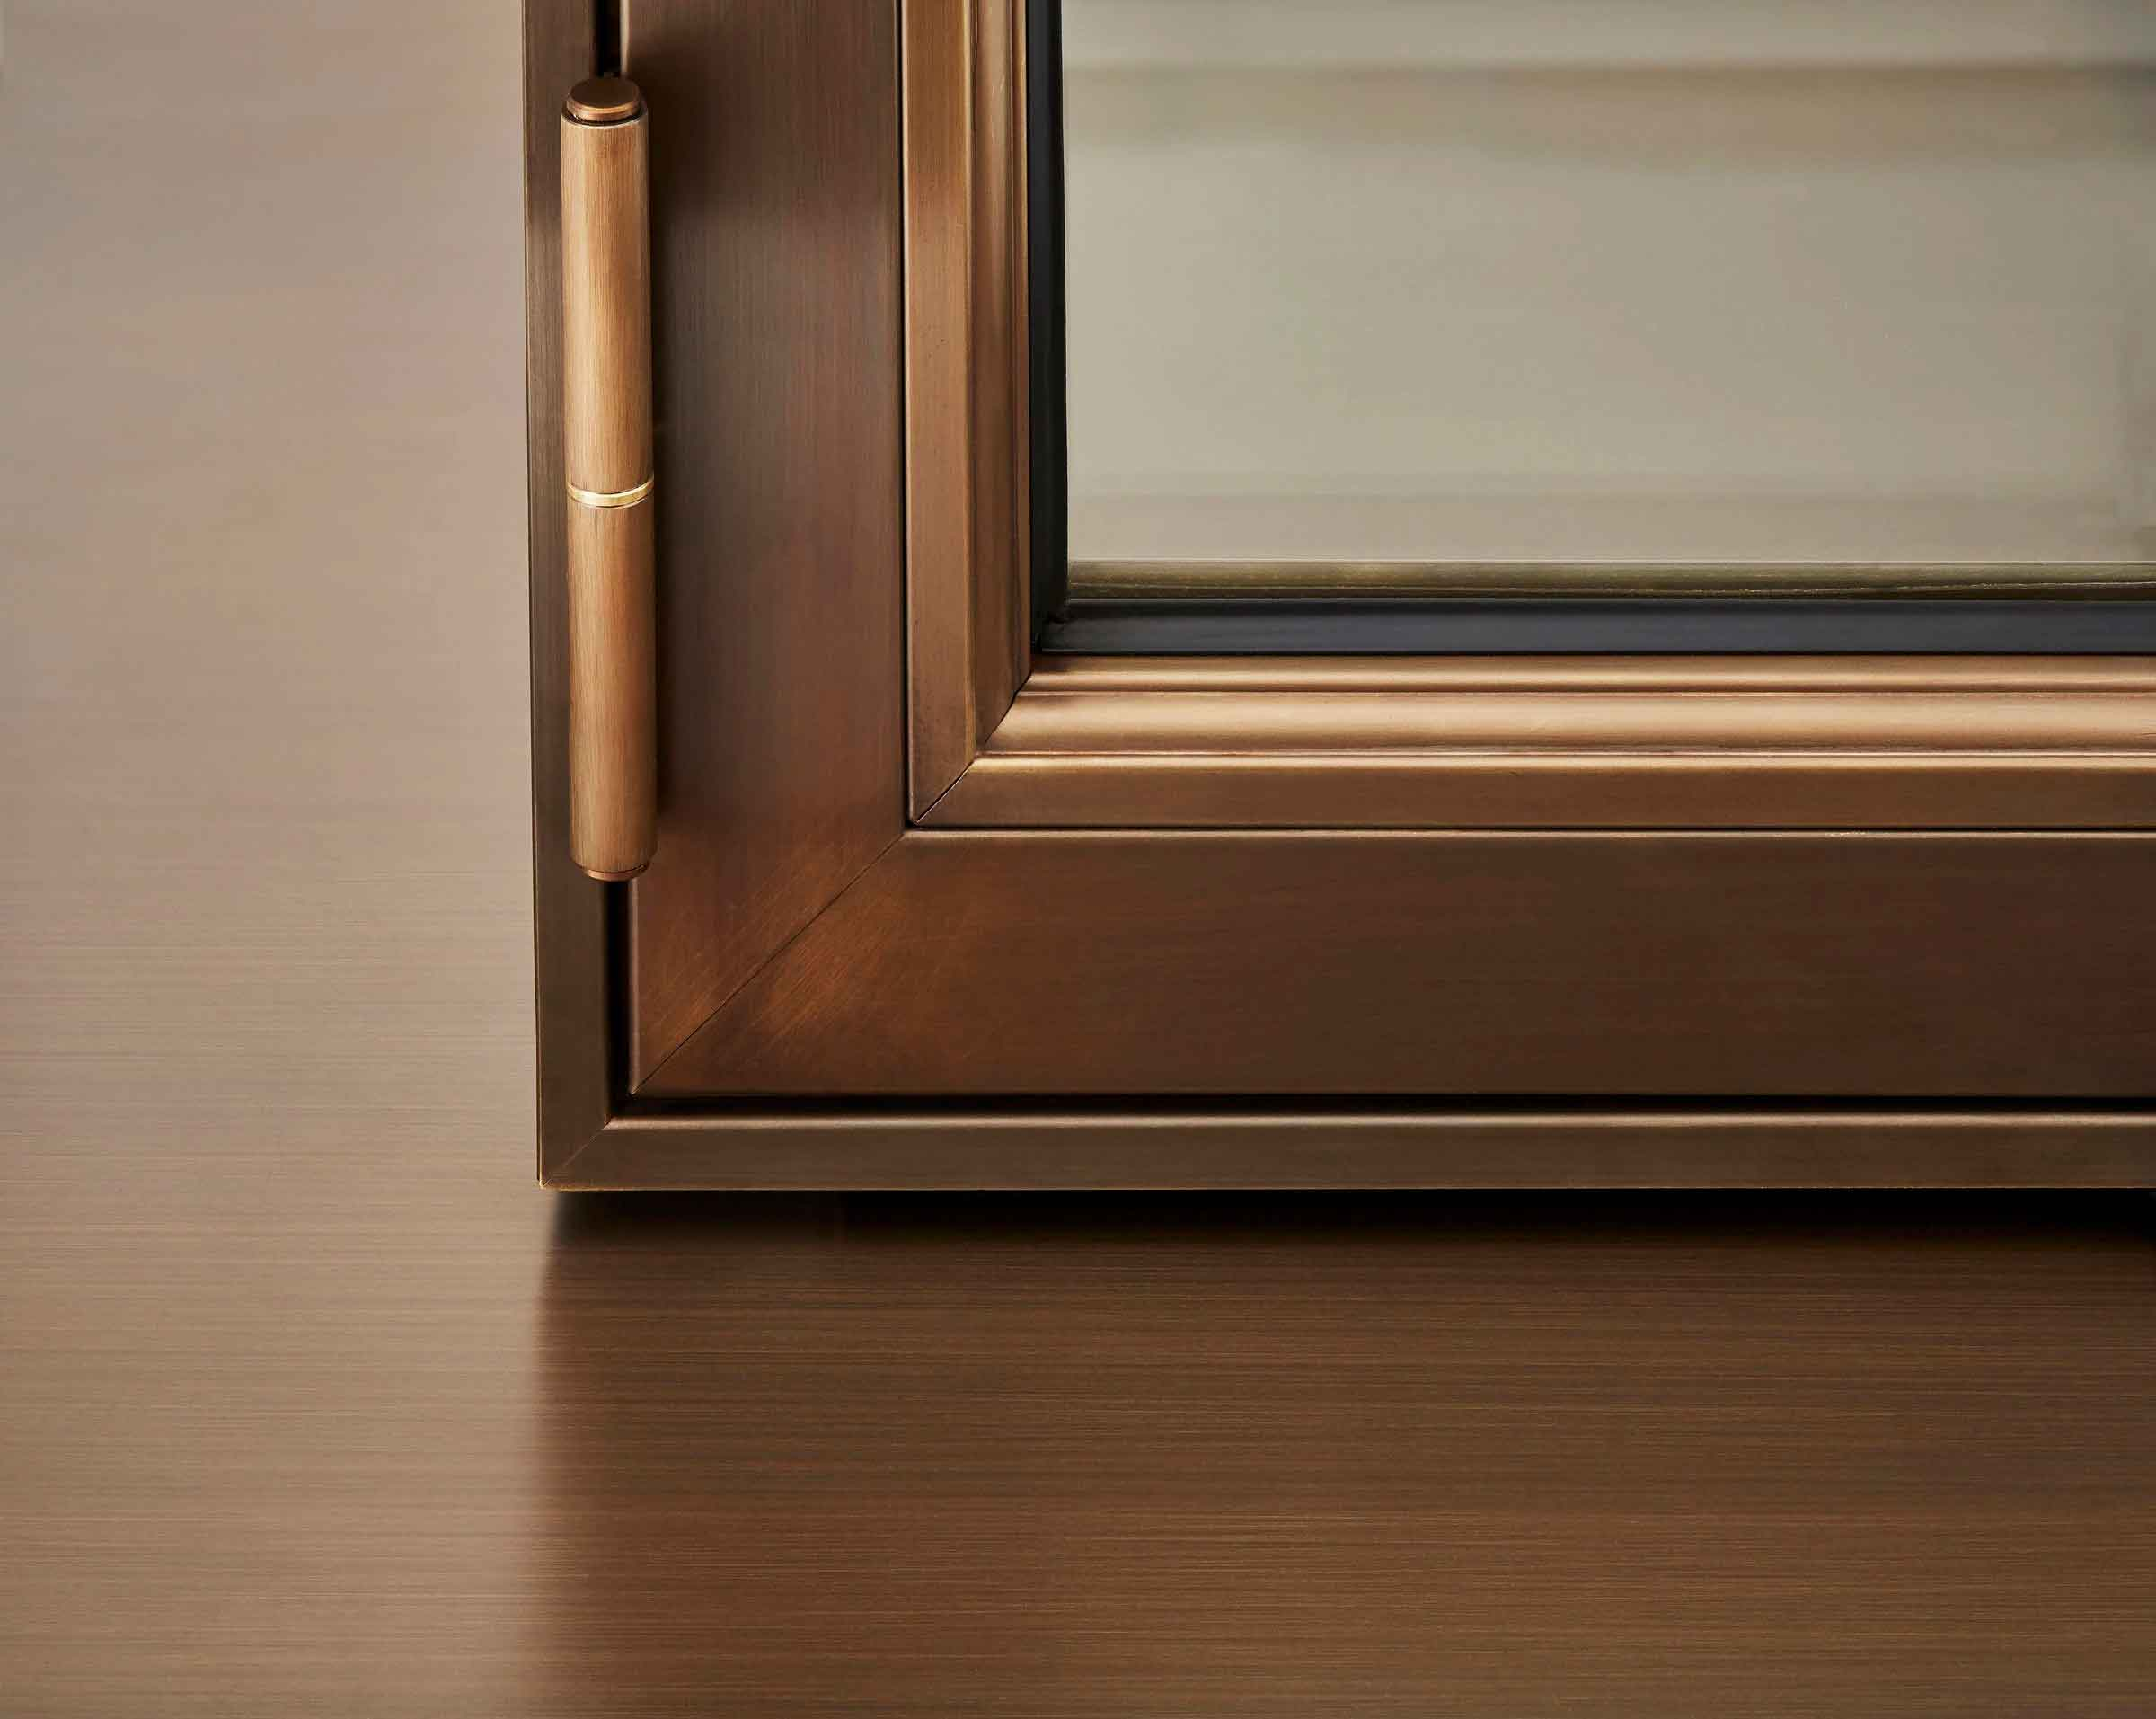 درب-و-پنجره-یو-پی-وی-سی-رنگی-آماج-صنعت-رنگی-103